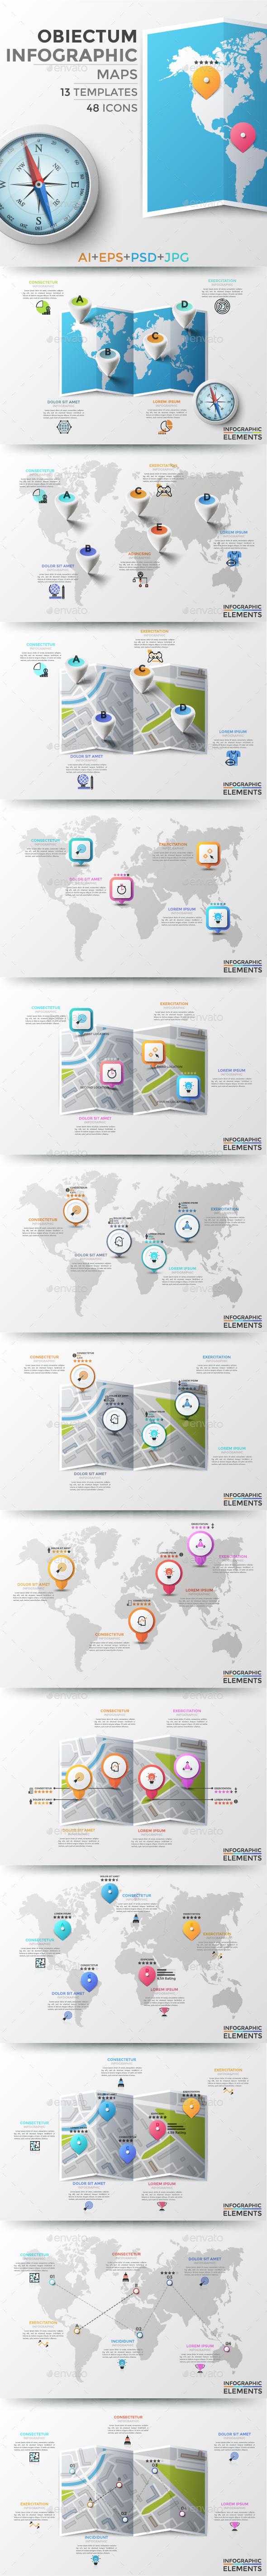 Obiectum Infographic. Maps - Infographics